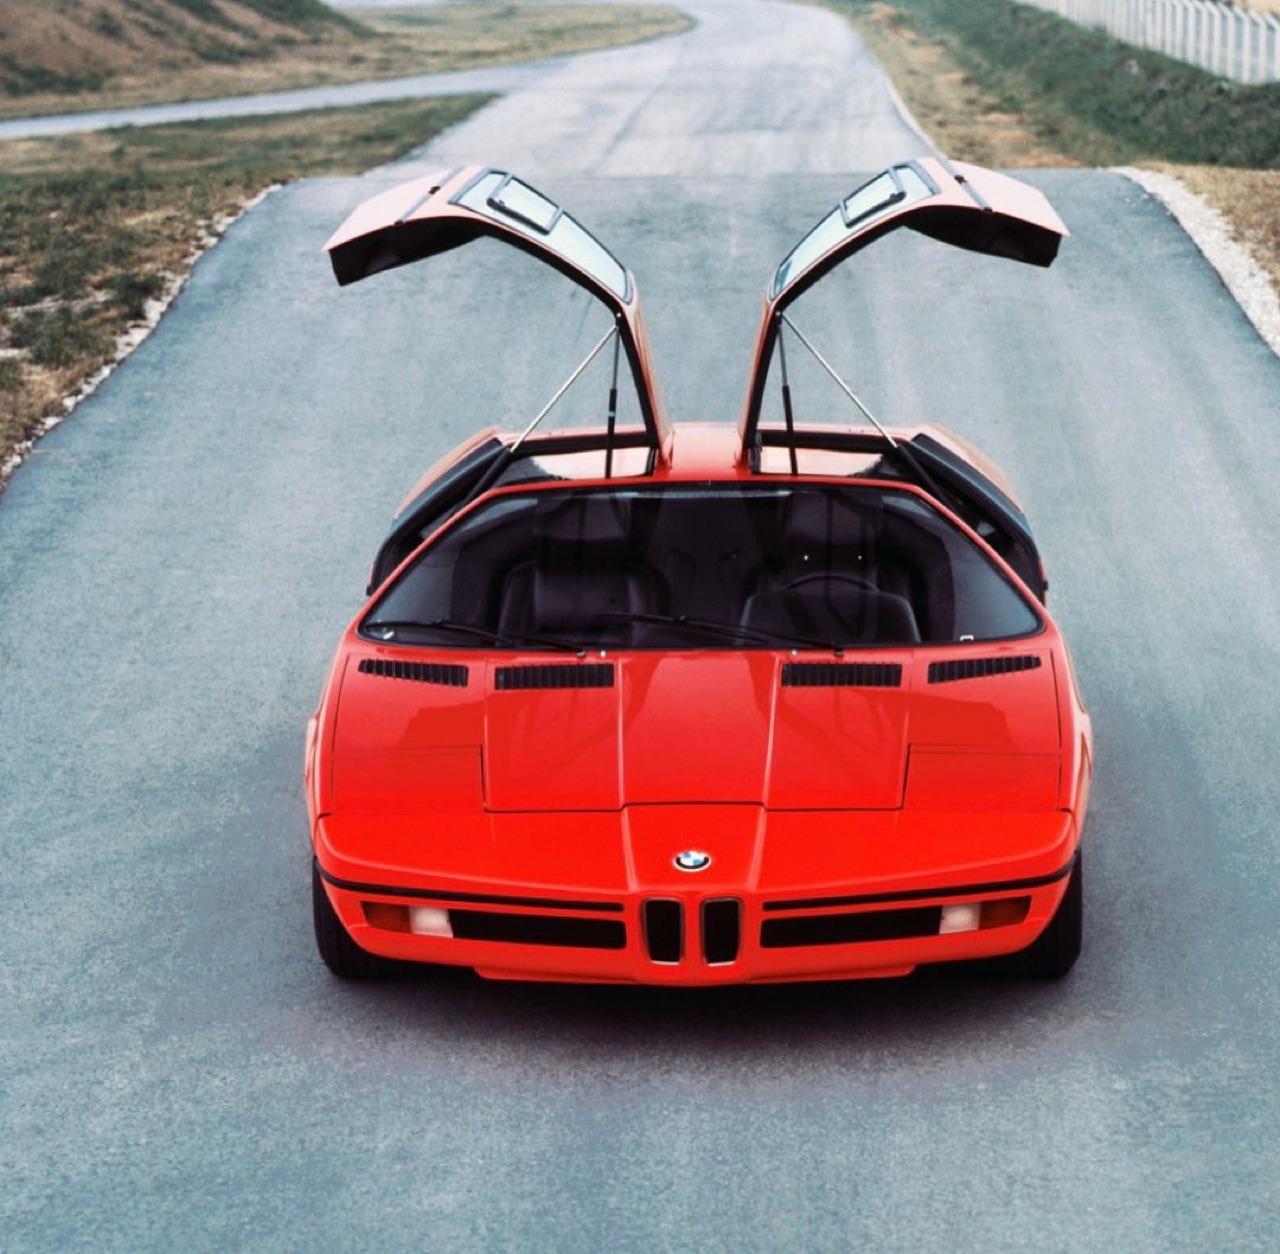 '72 BMW Turbo Concept... Médaille d'or ! 1